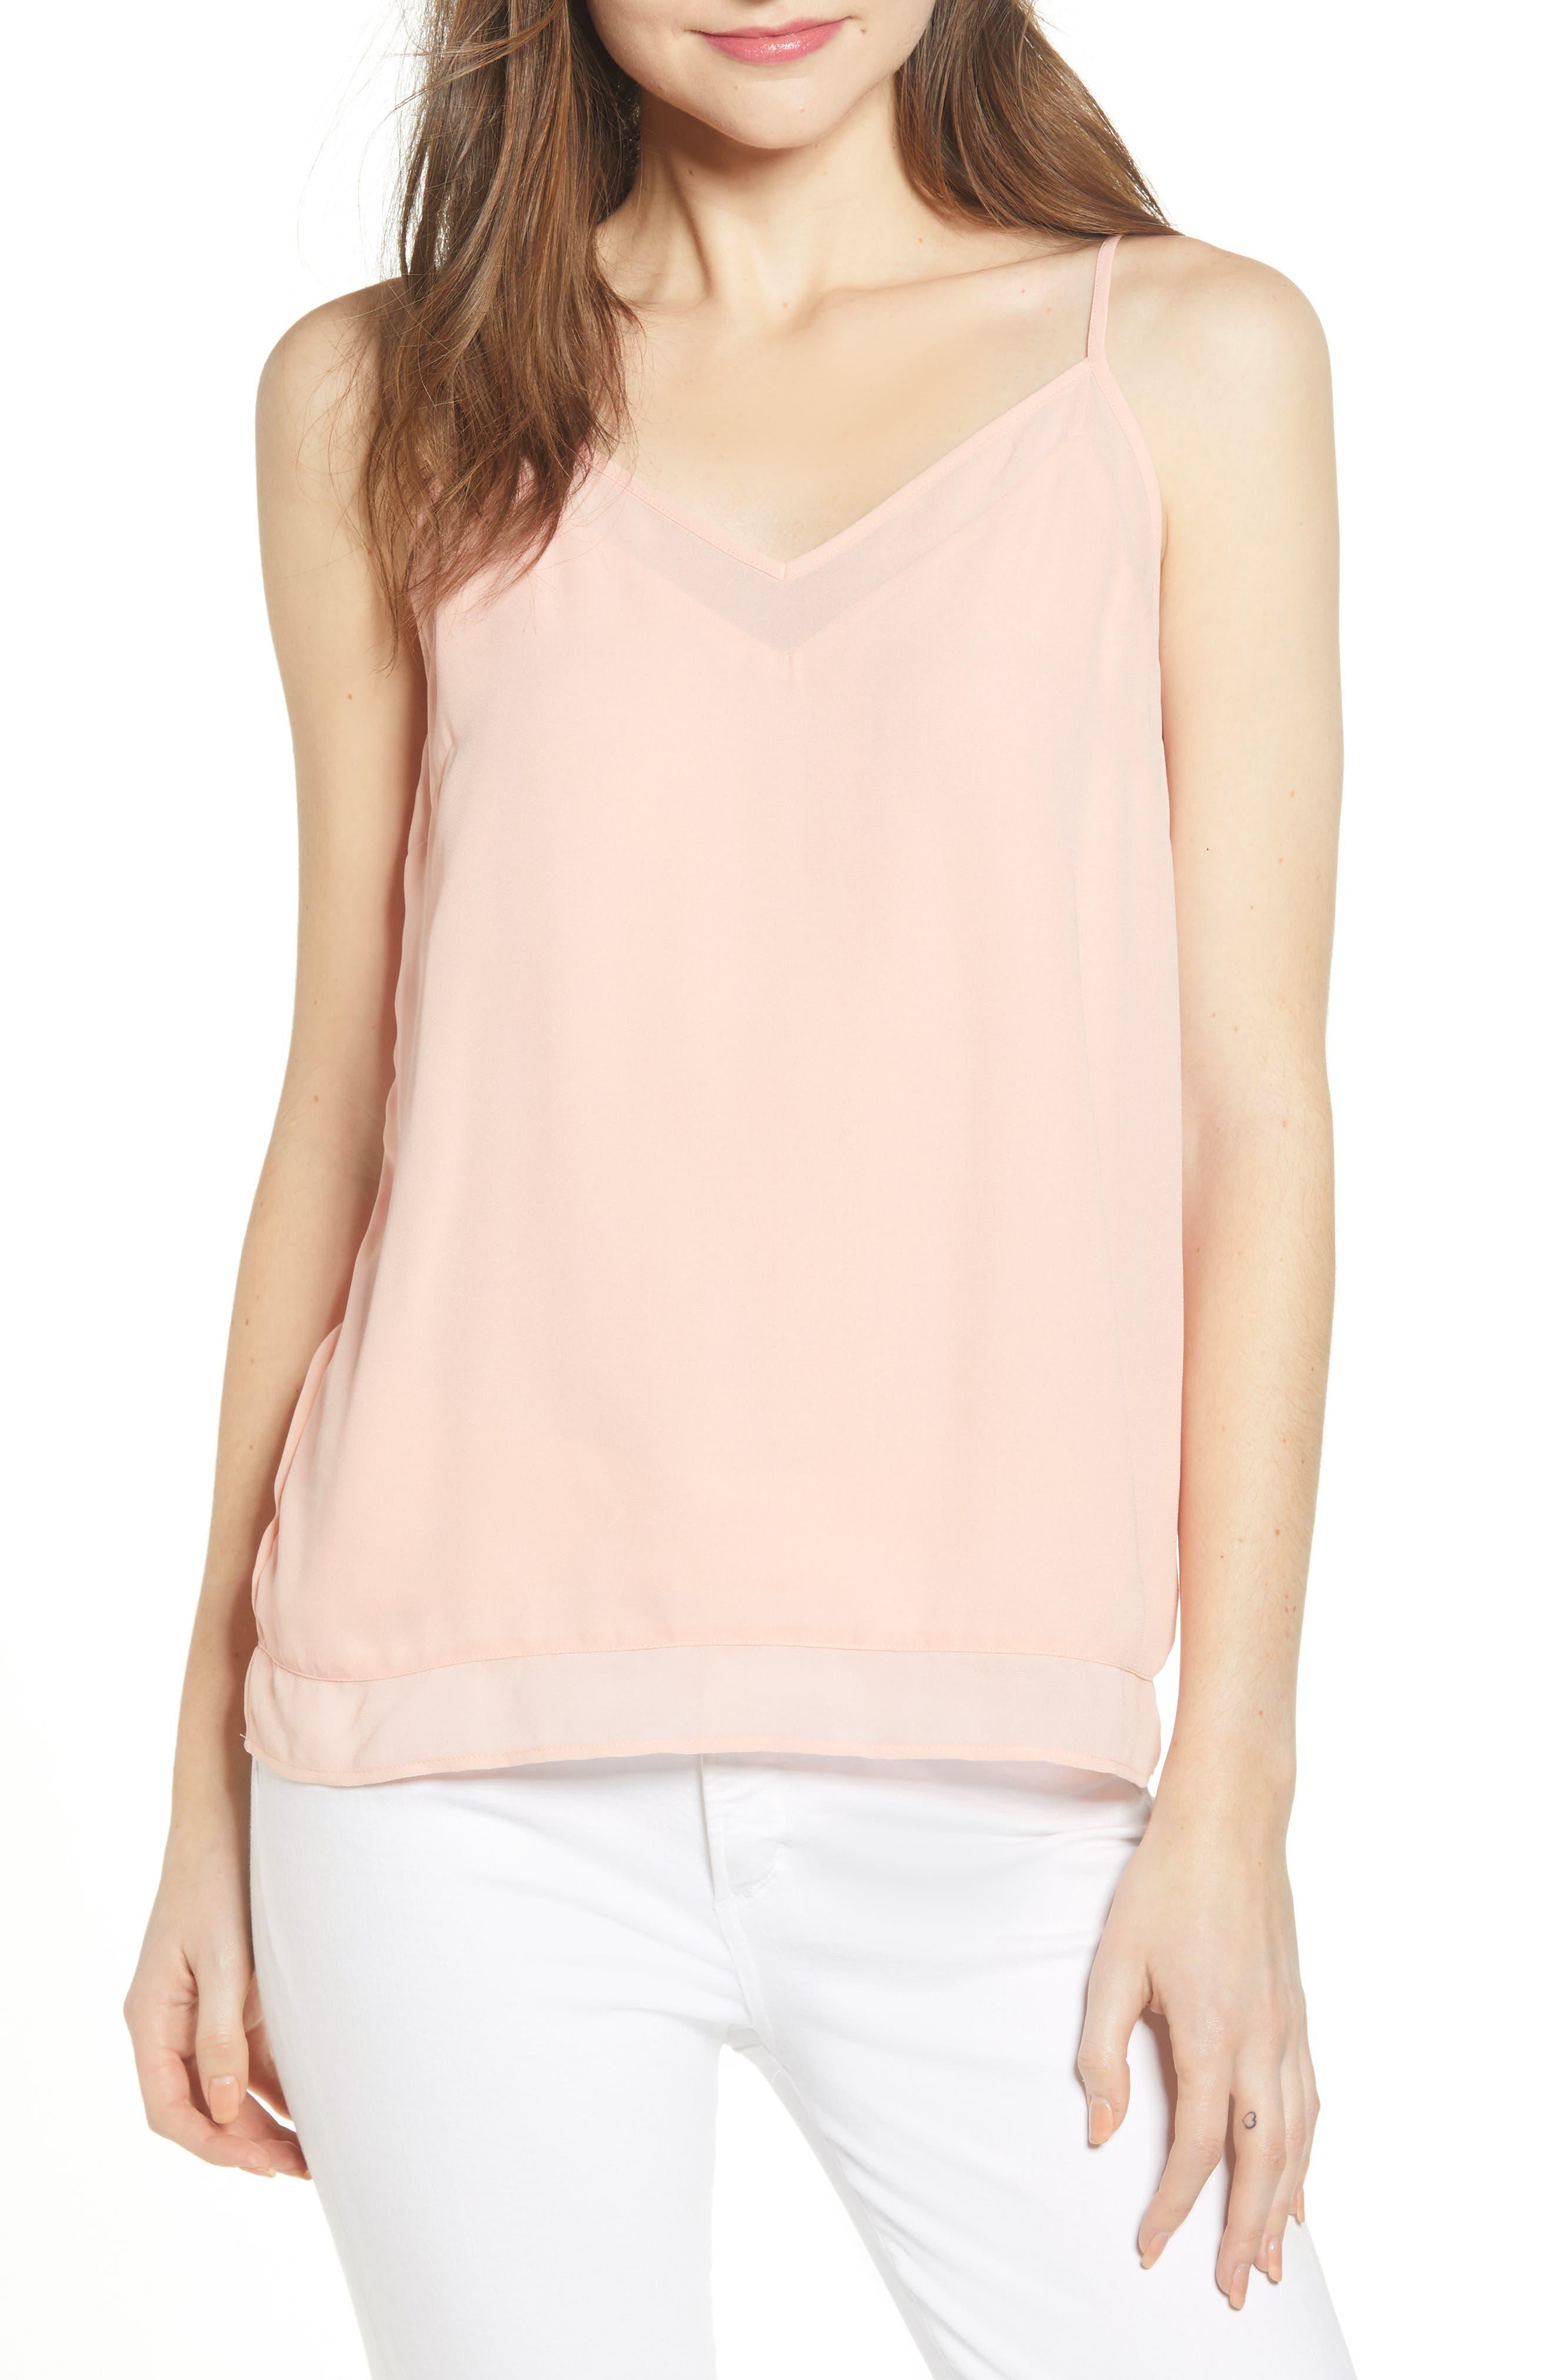 Chelsea28 Illusion Camisole, Pink